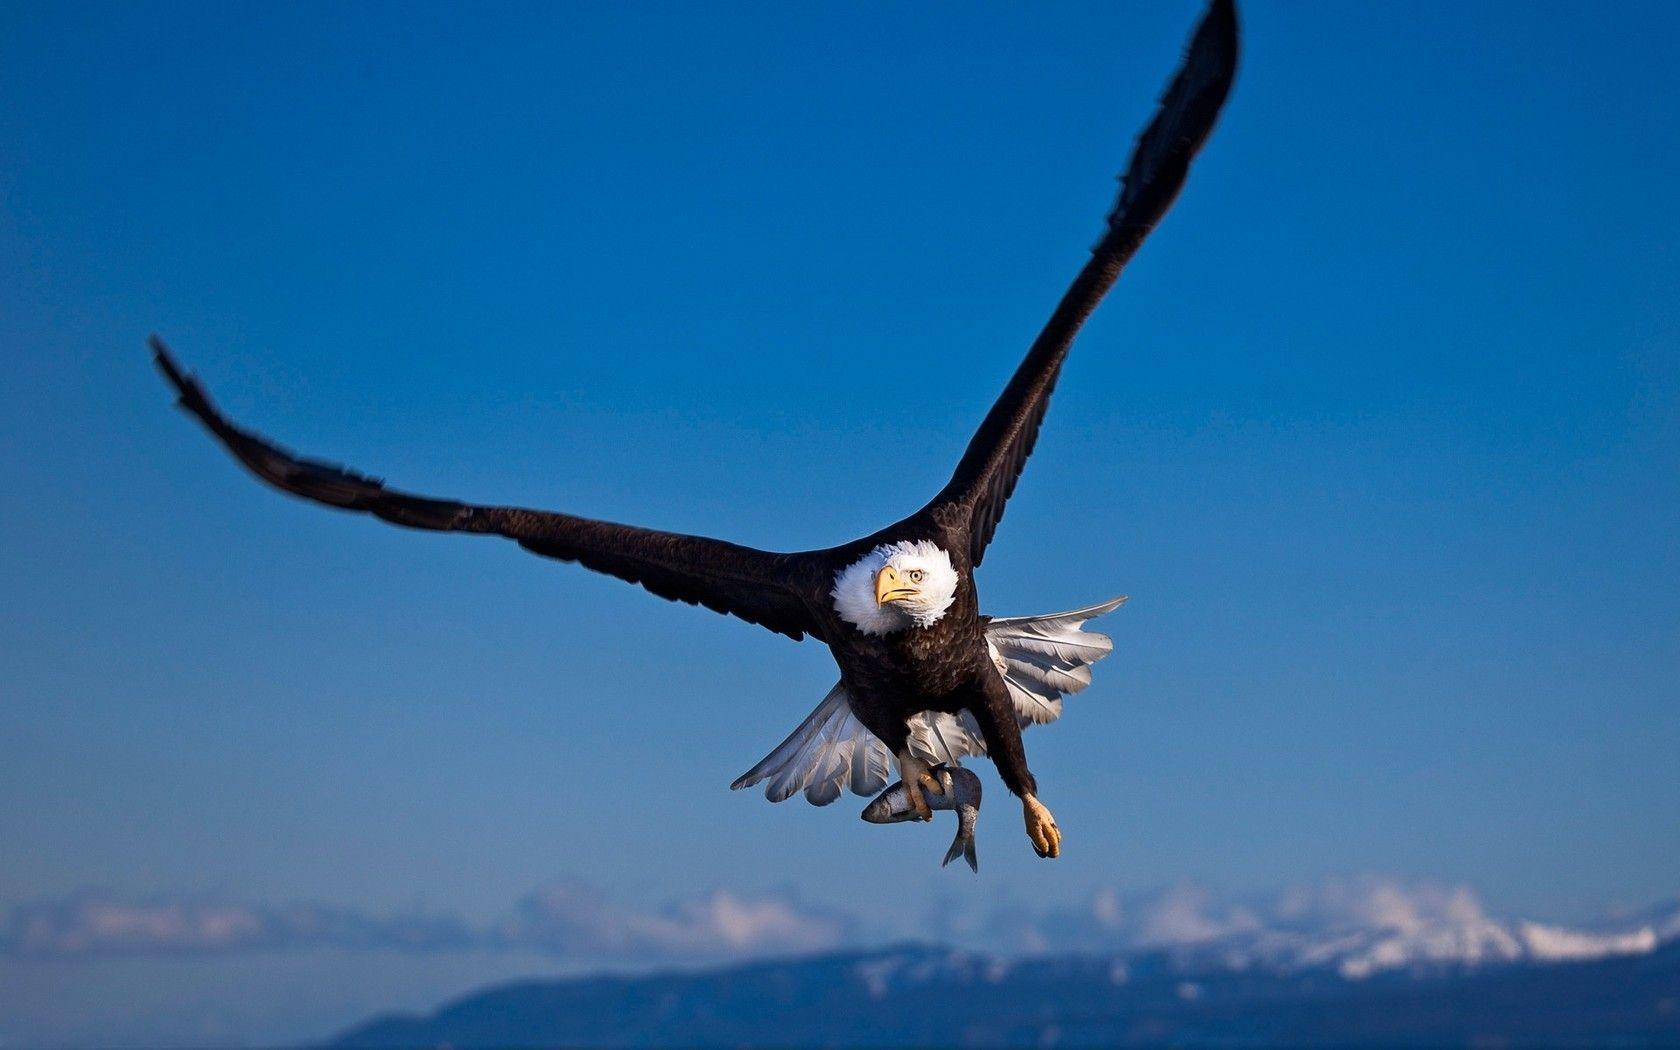 Hd wallpaper eagle - Eagle Wallpaper For Computer